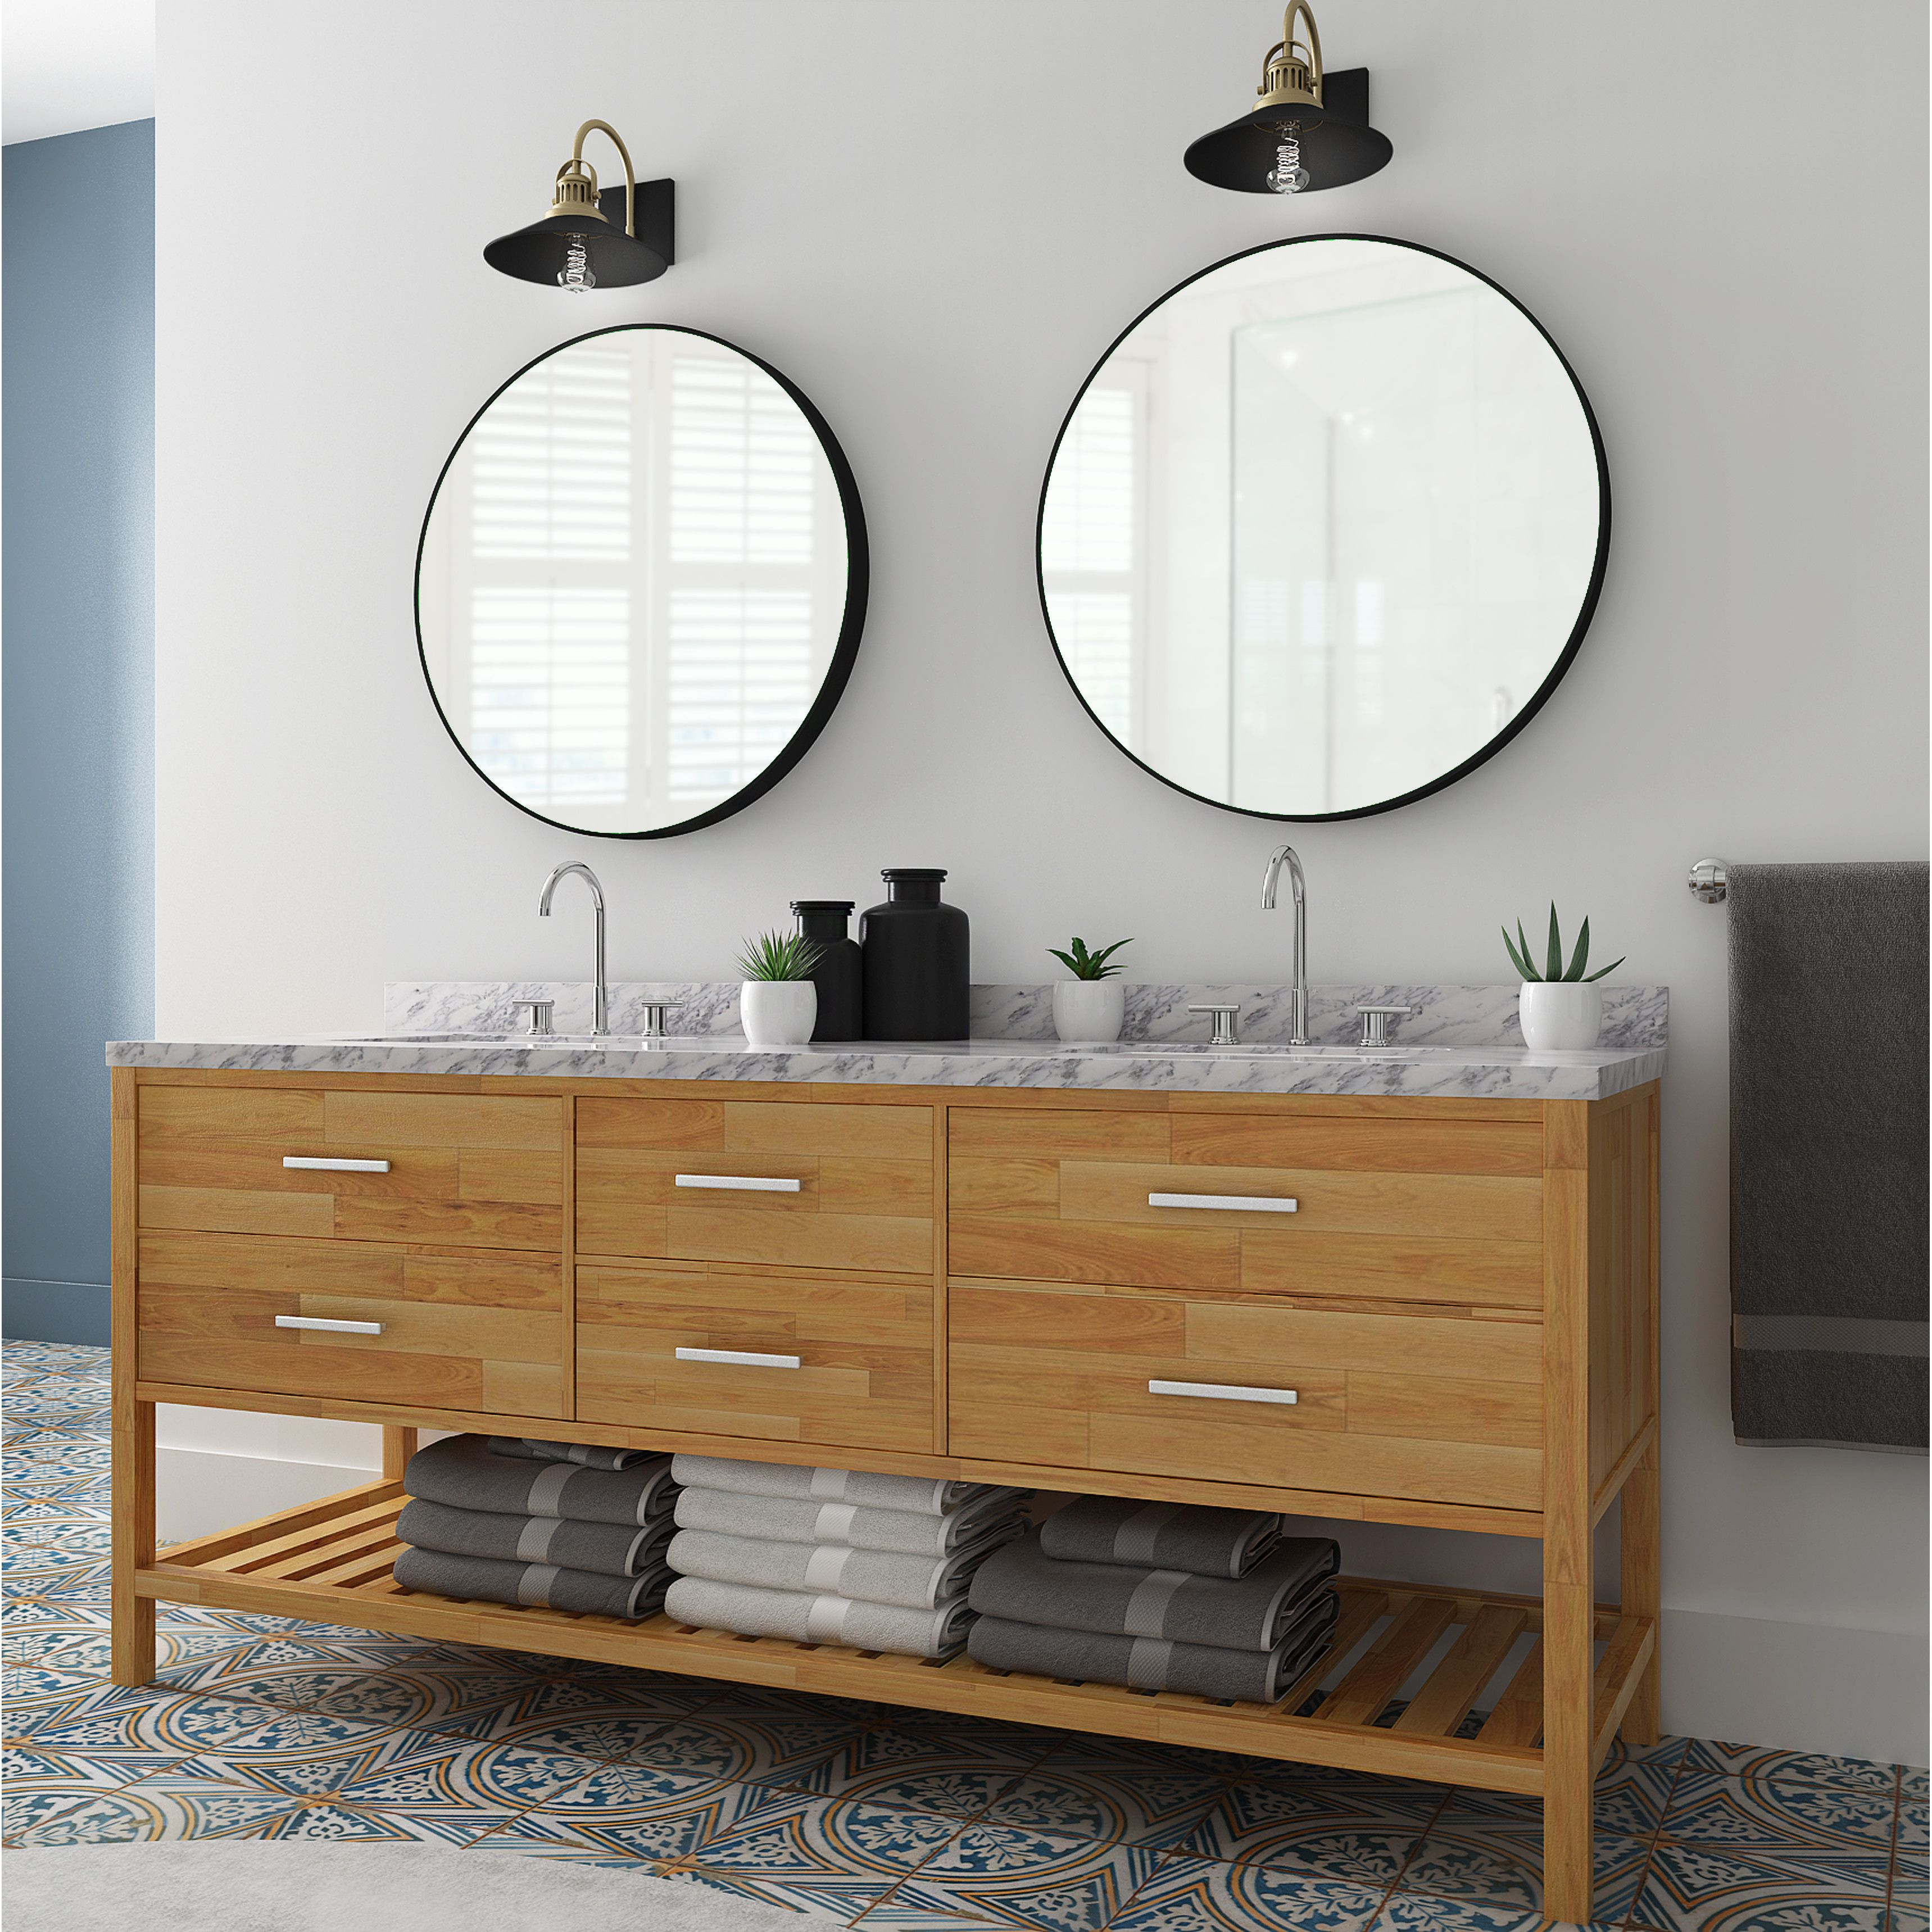 Molina Wall Mirror